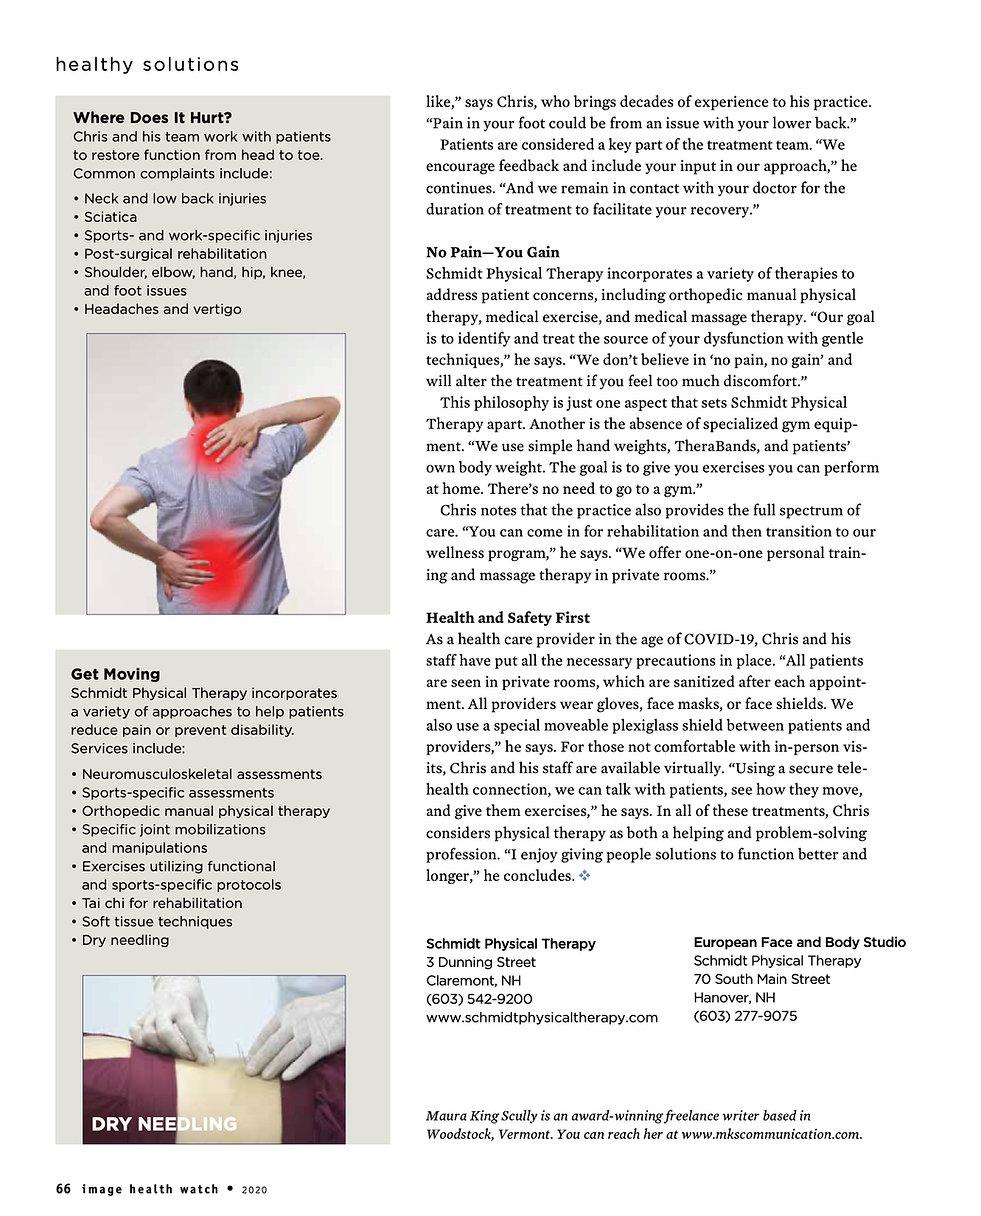 PDF Hanover Magazine 20202.jpg